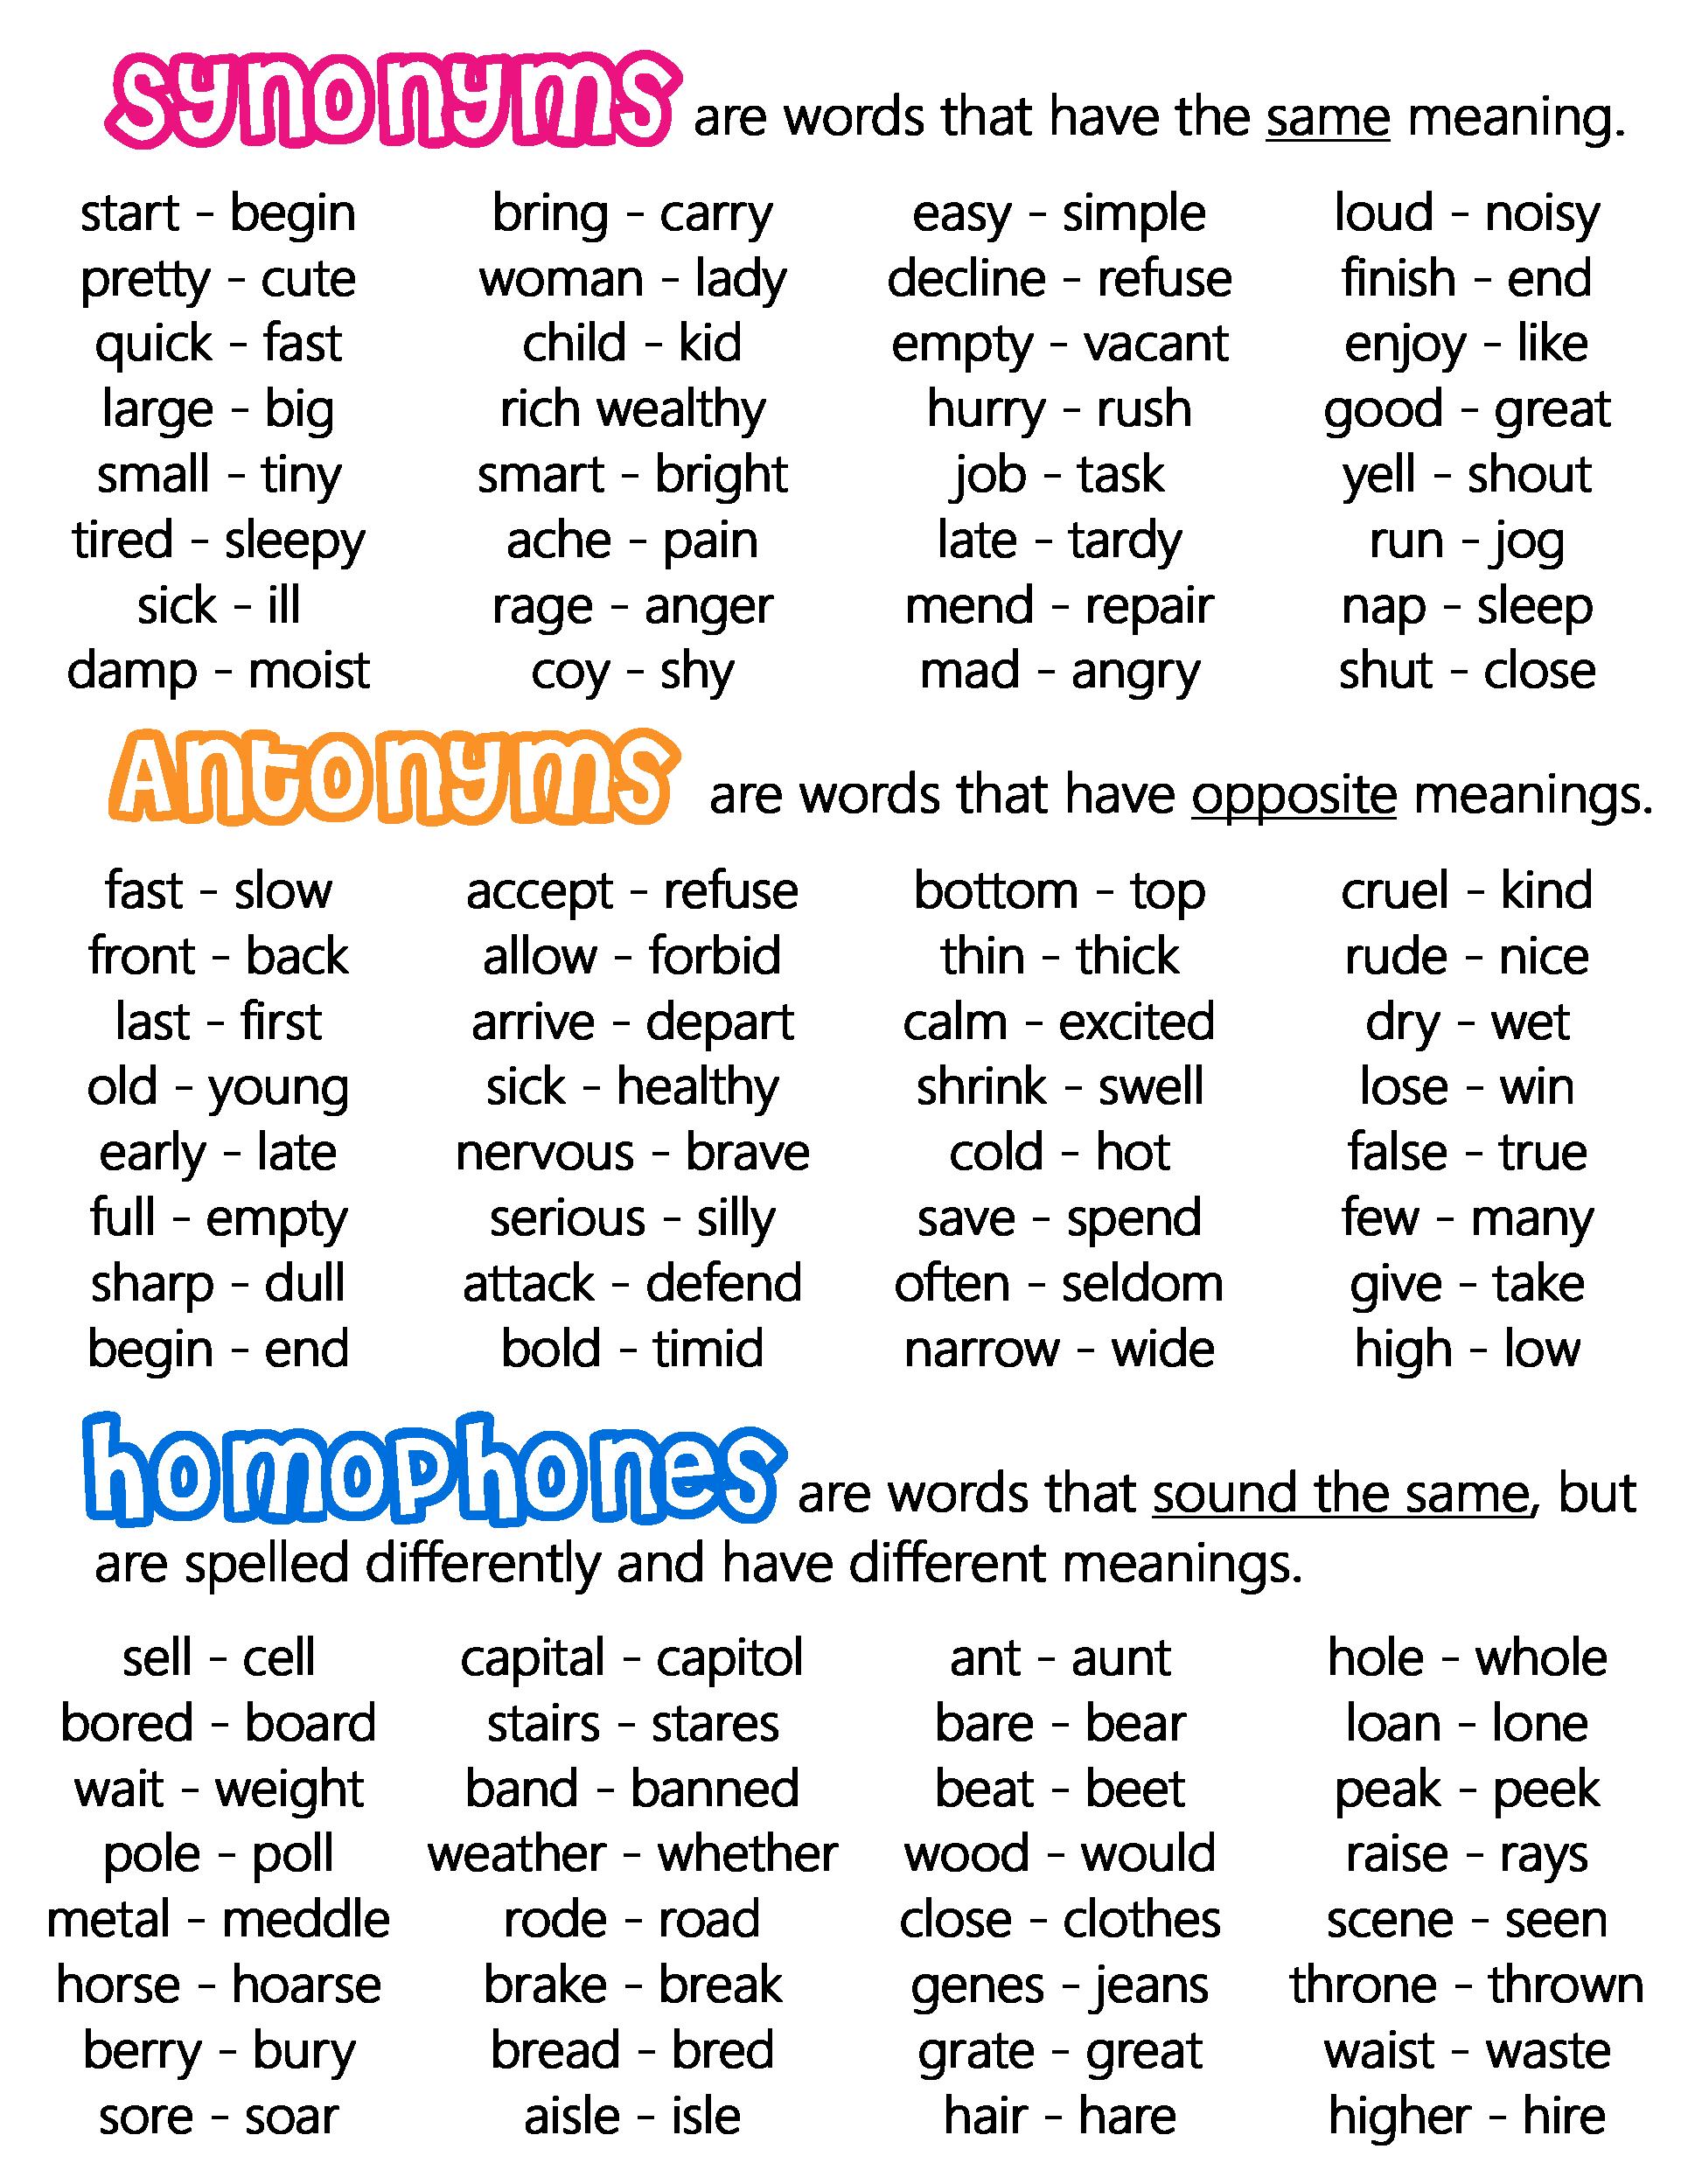 Synonyms Antonyms Homophones Anchor Chart Jungle Academy Teaching Synonyms Synonyms And Antonyms Homophones Anchor Chart